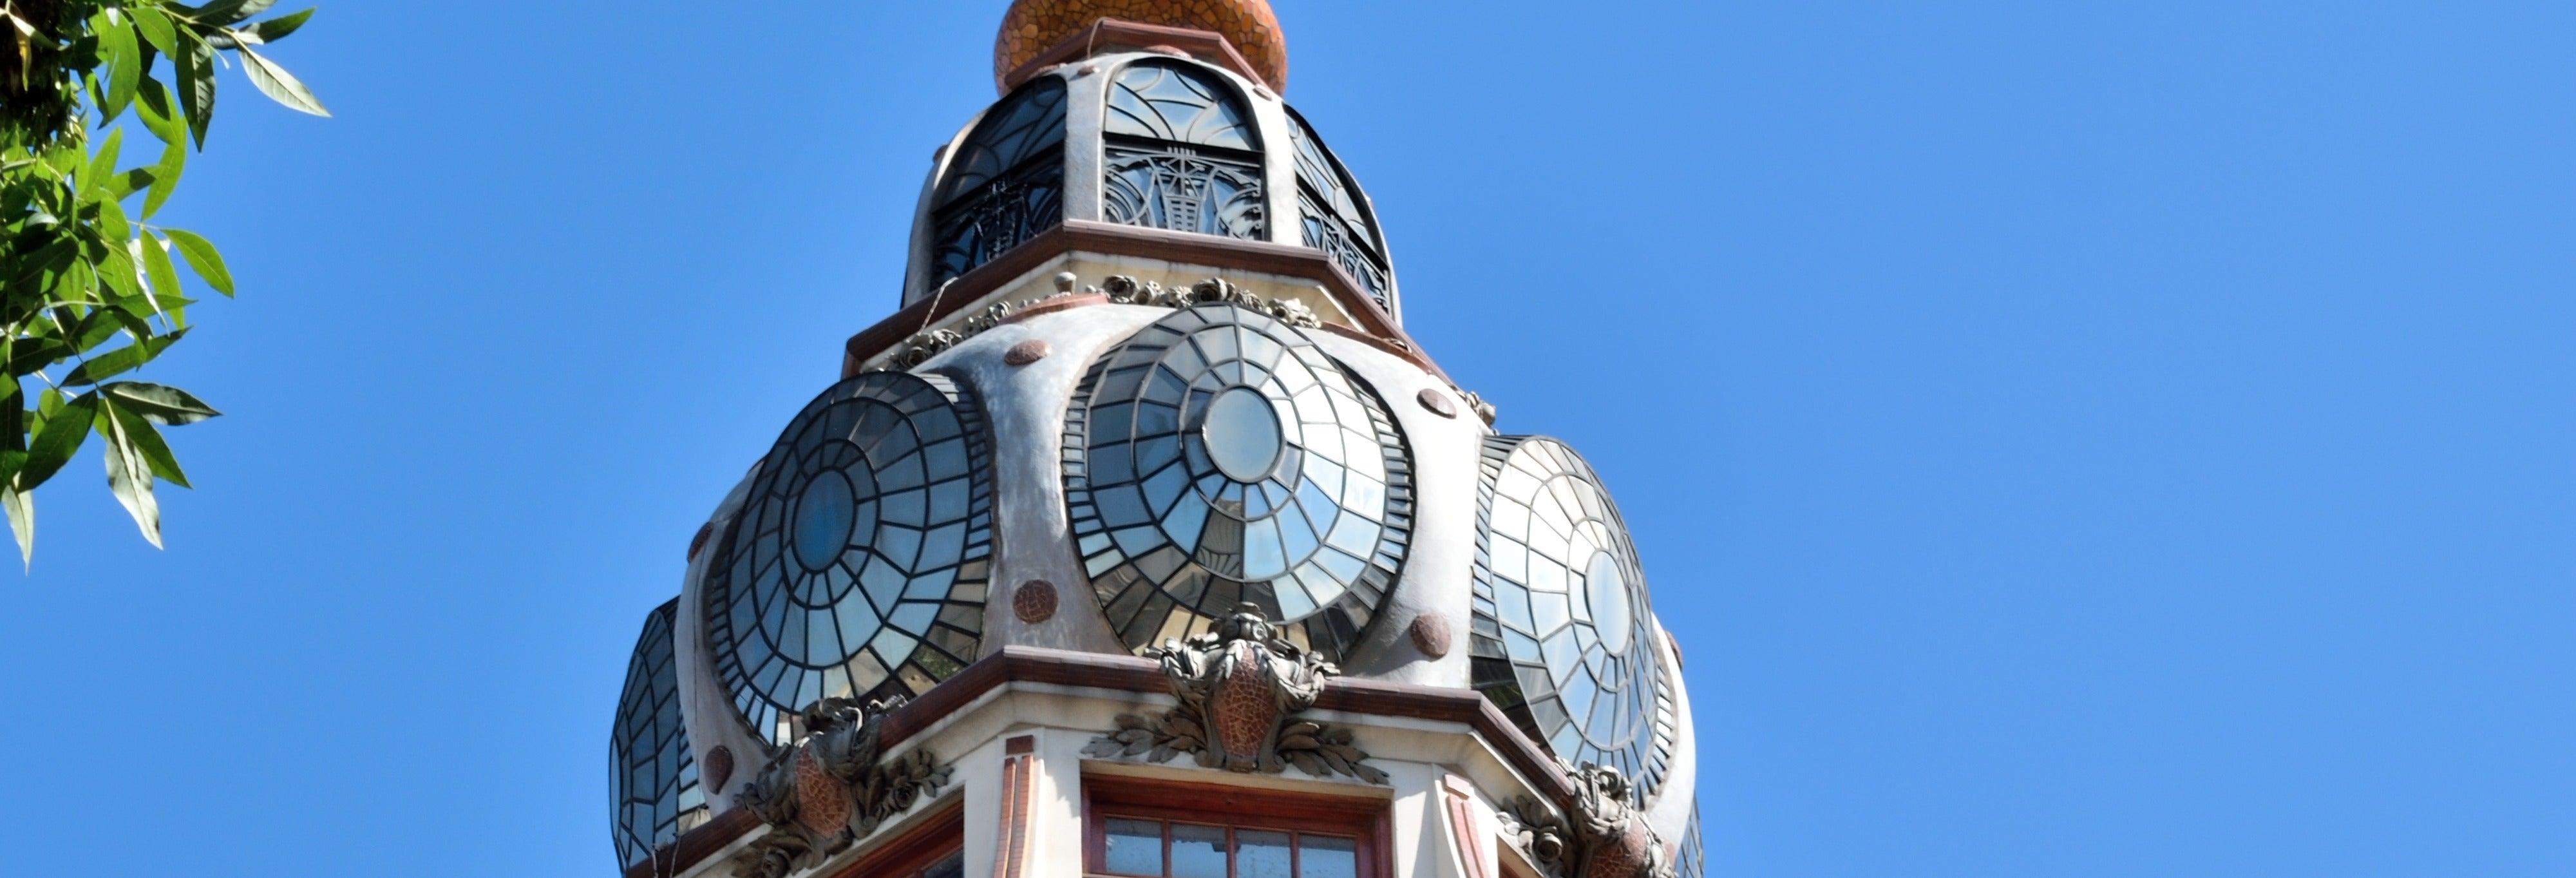 Tour de las cúpulas de Buenos Aires